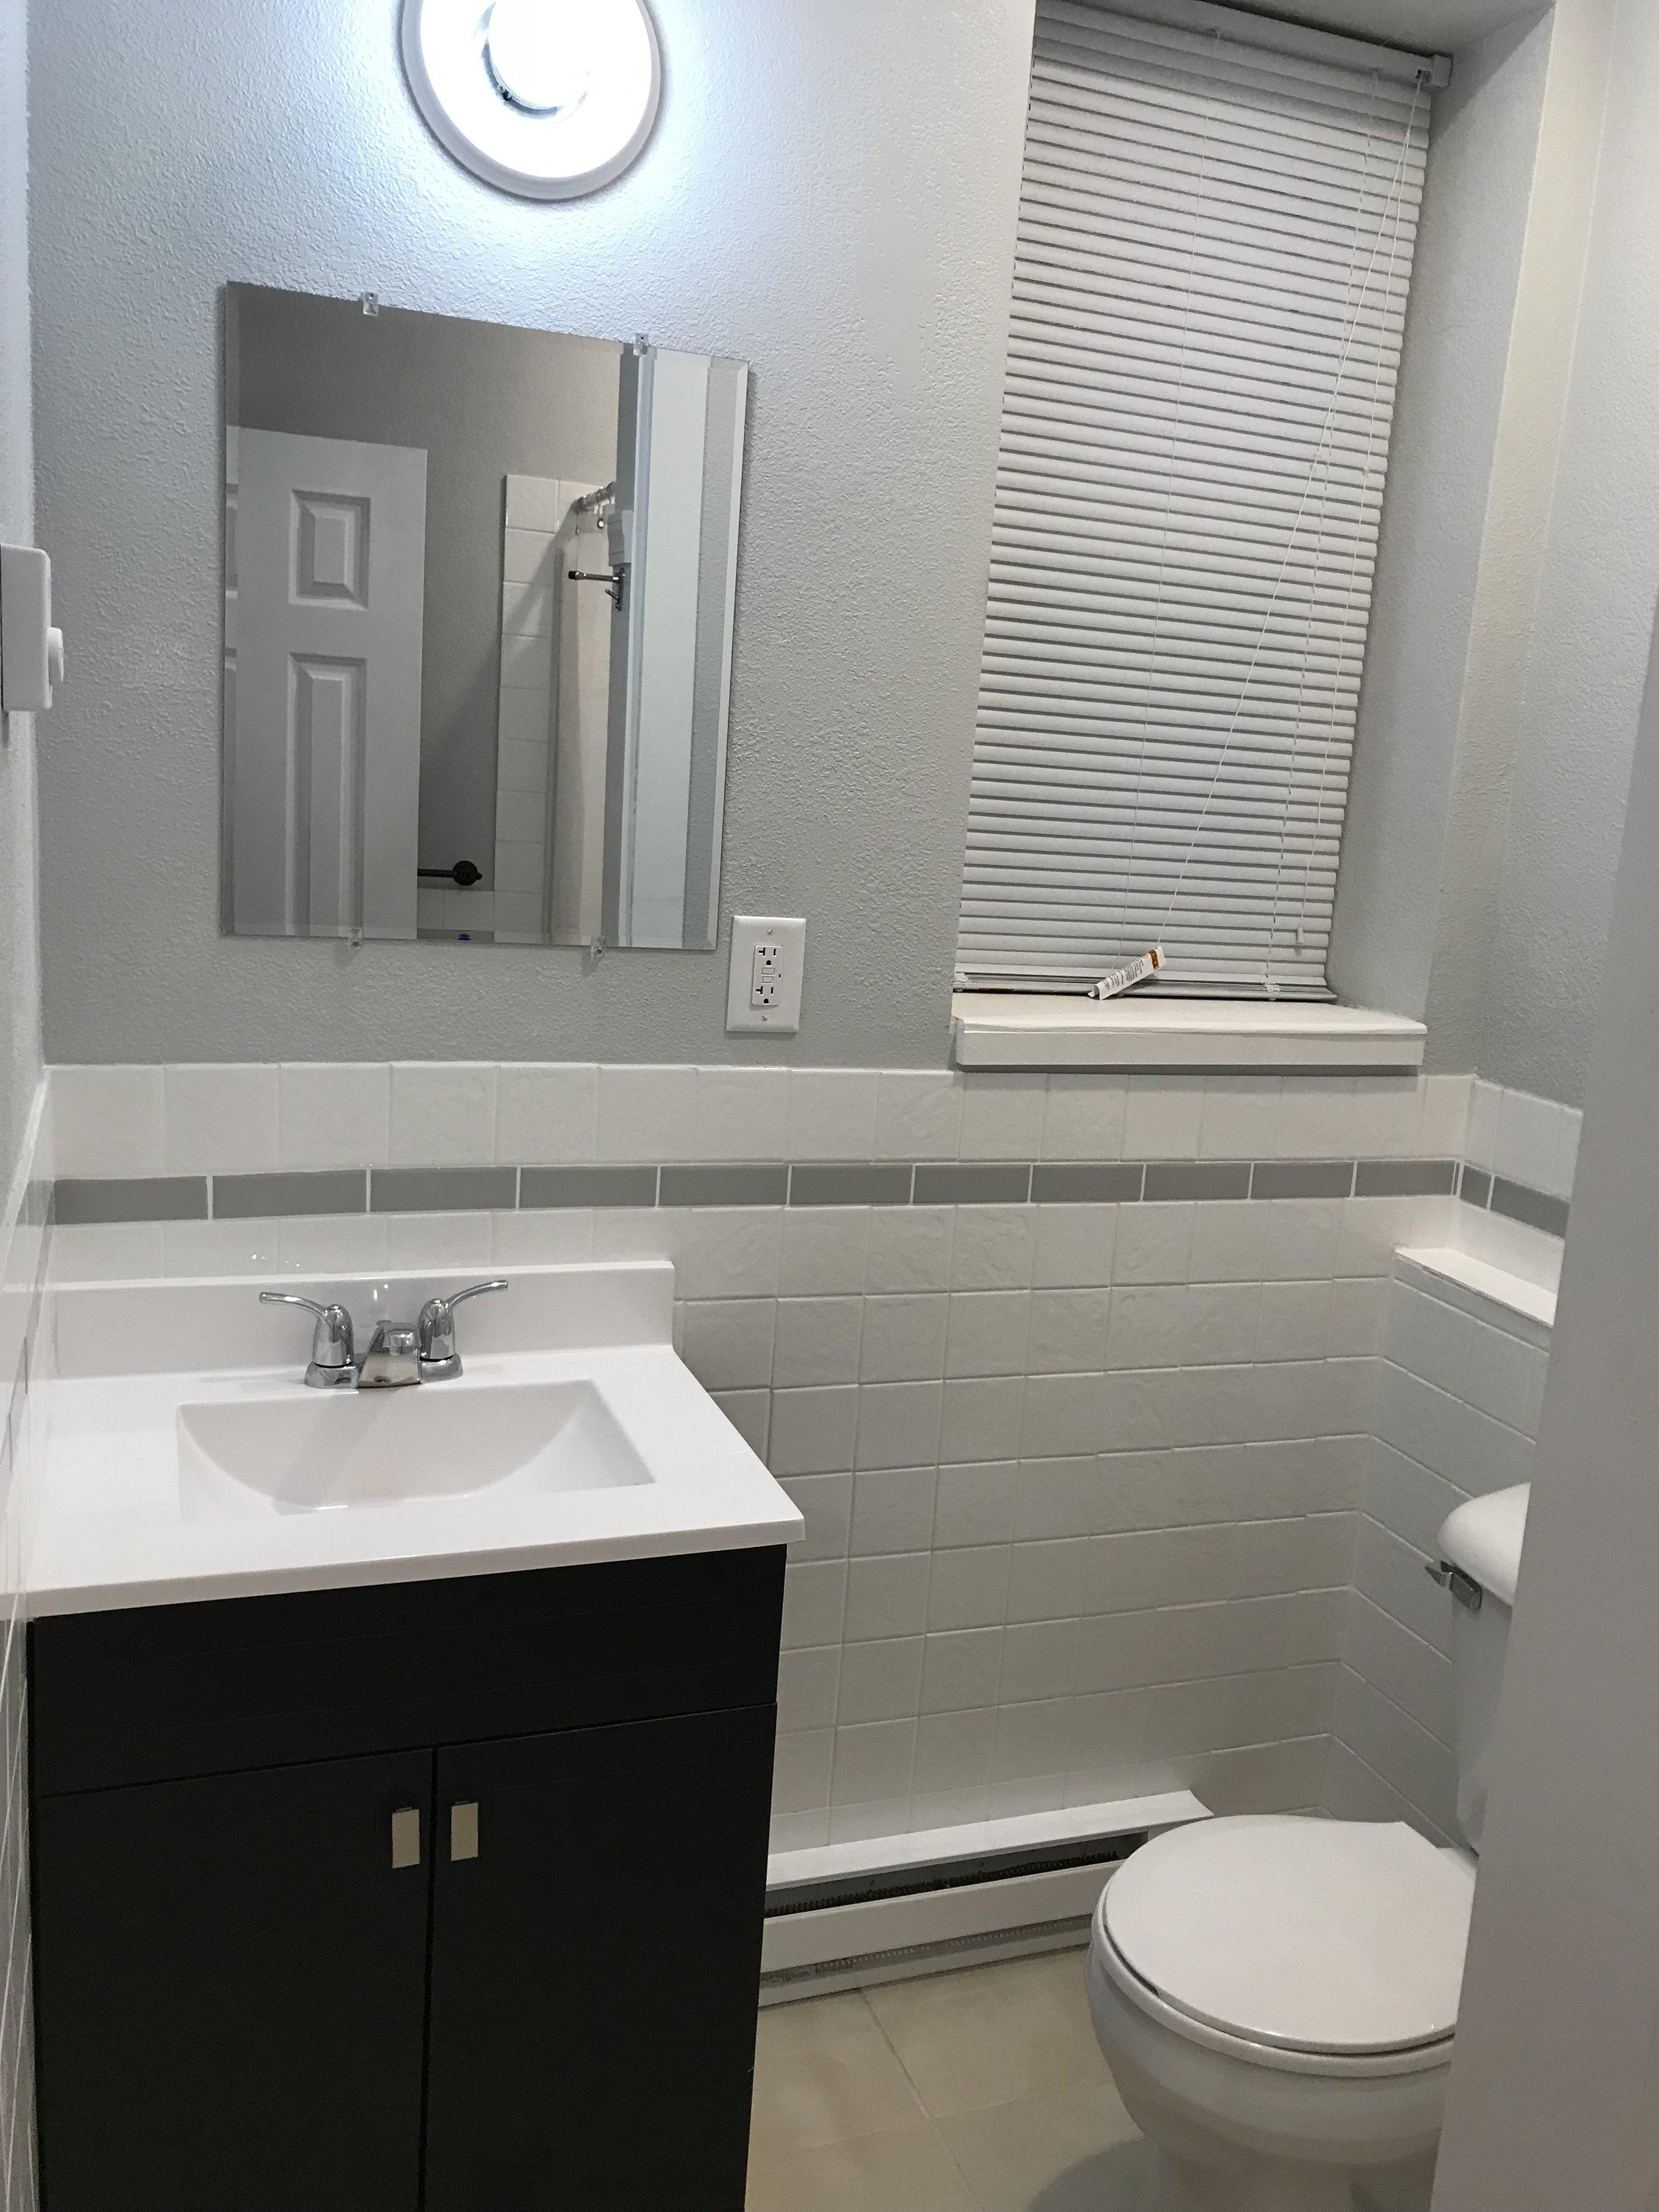 Bath.  Wooden Vanity with Solid Top